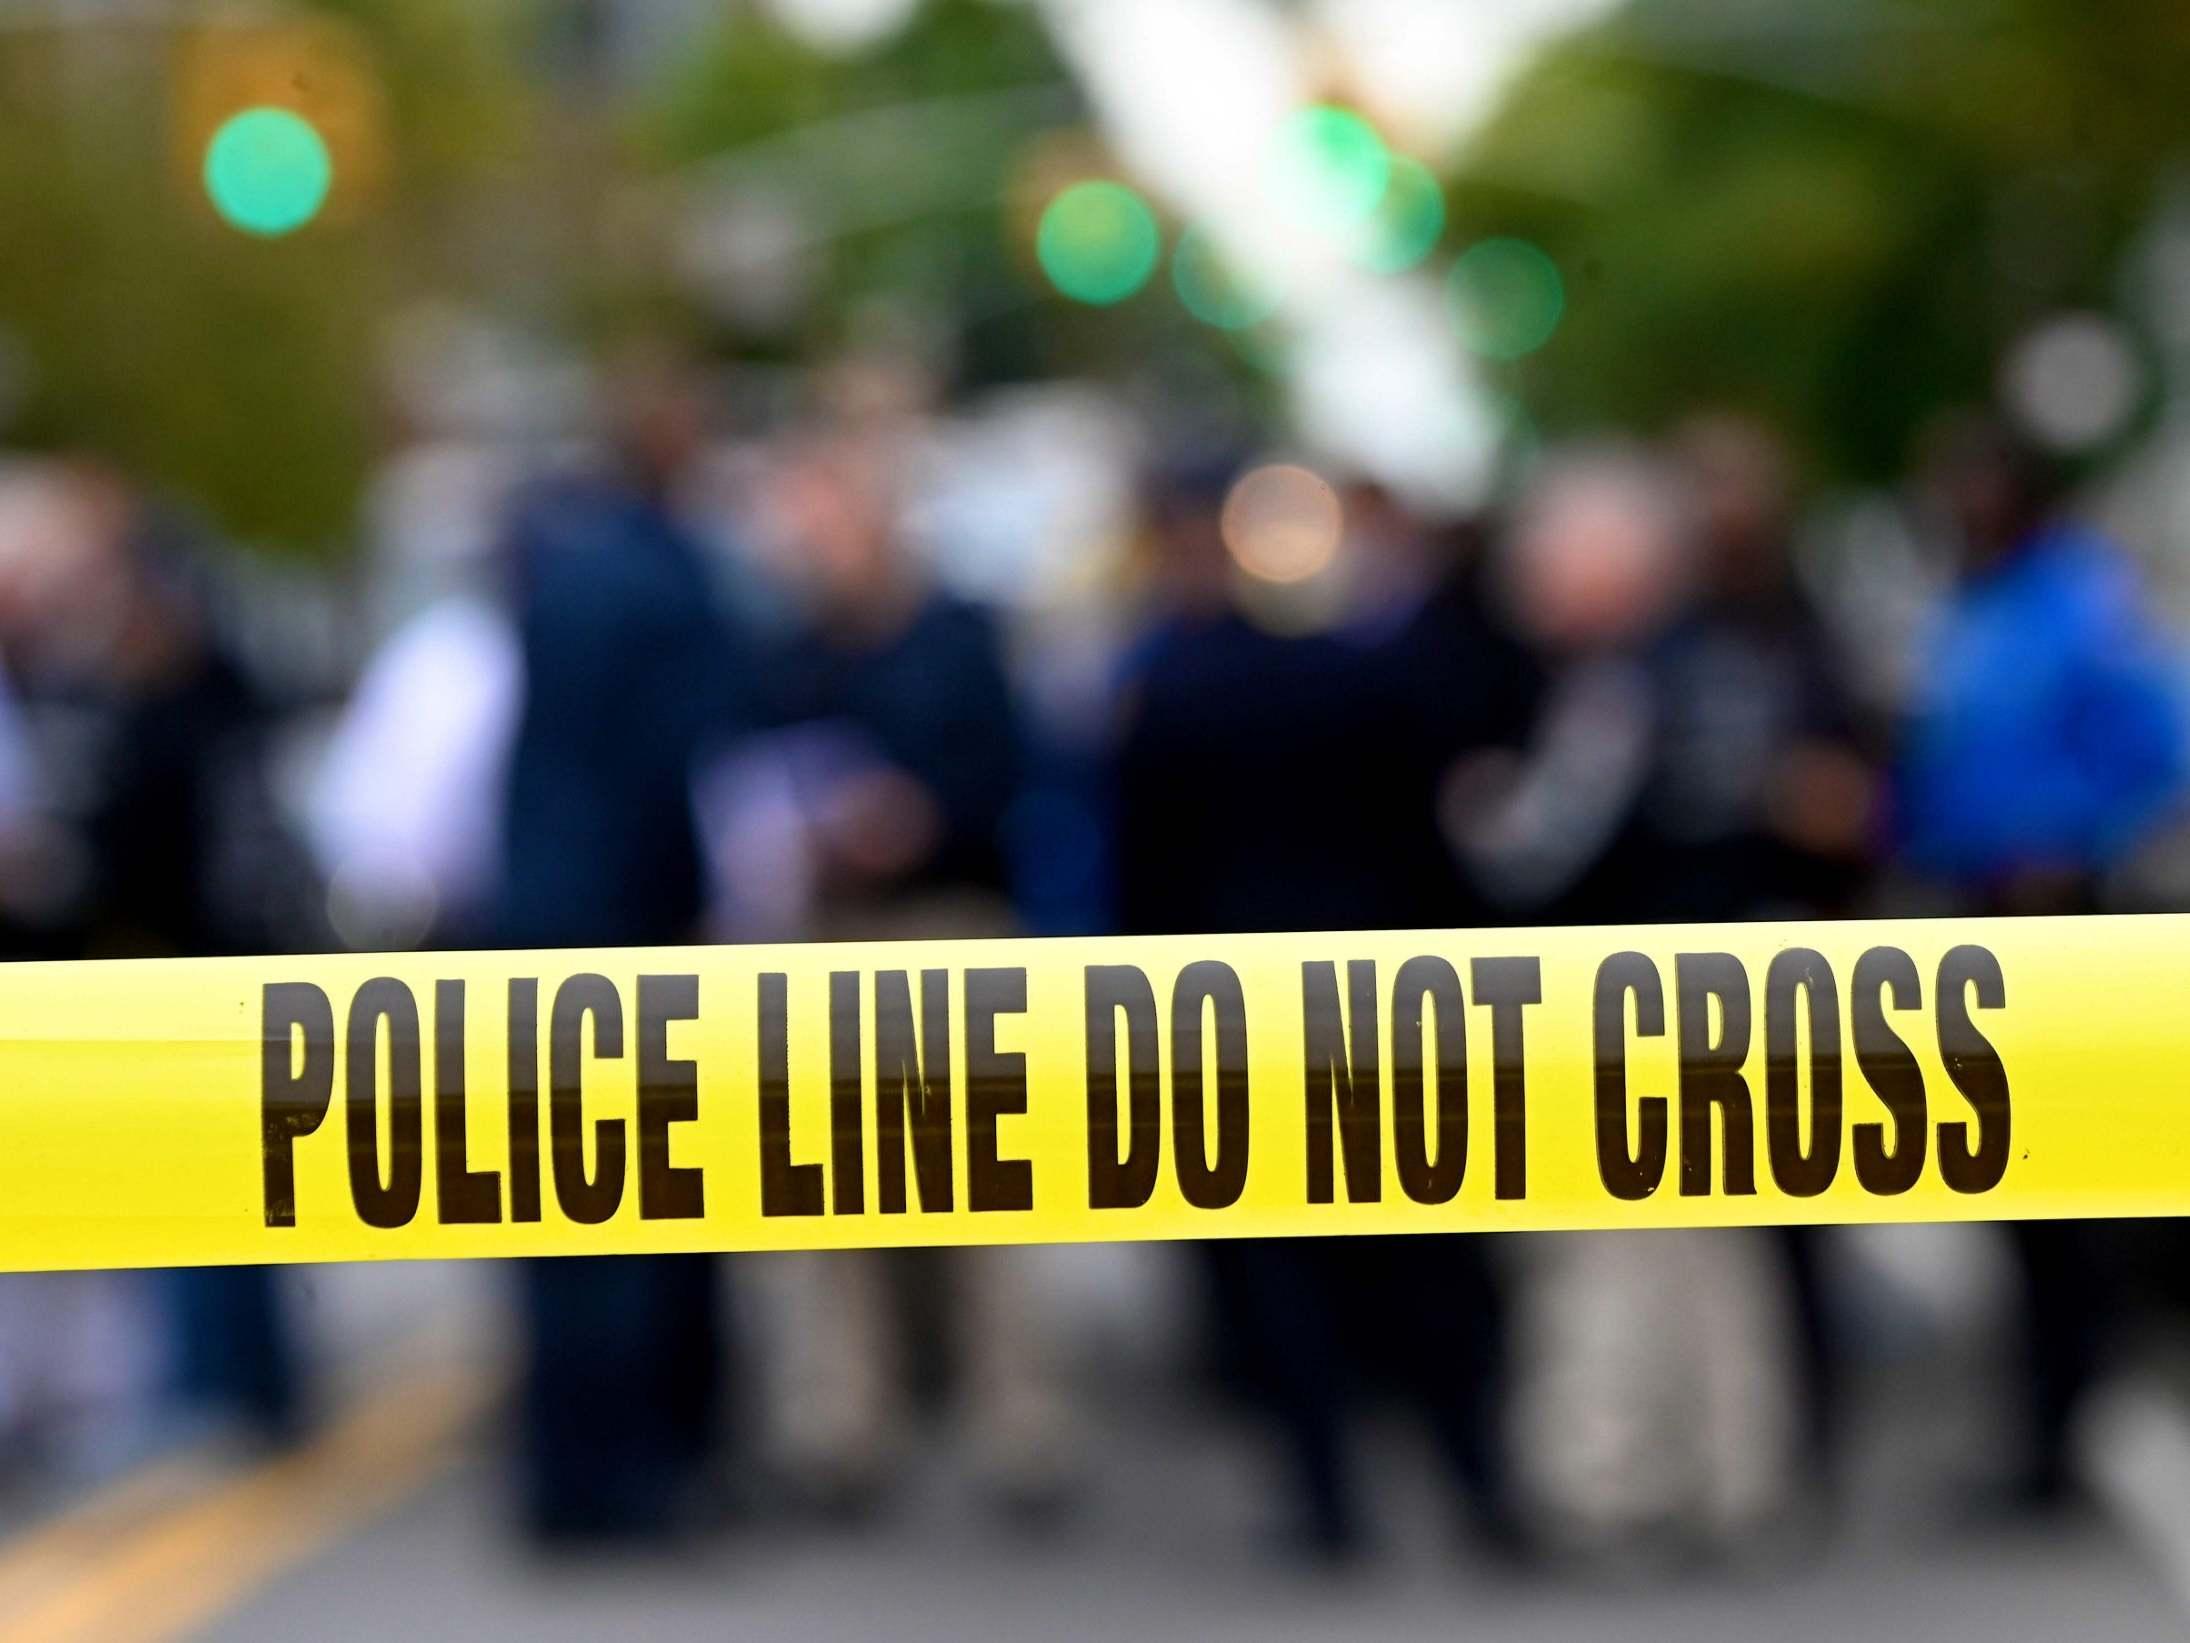 Brooklyn bodega worker in custody after fatally shooting man